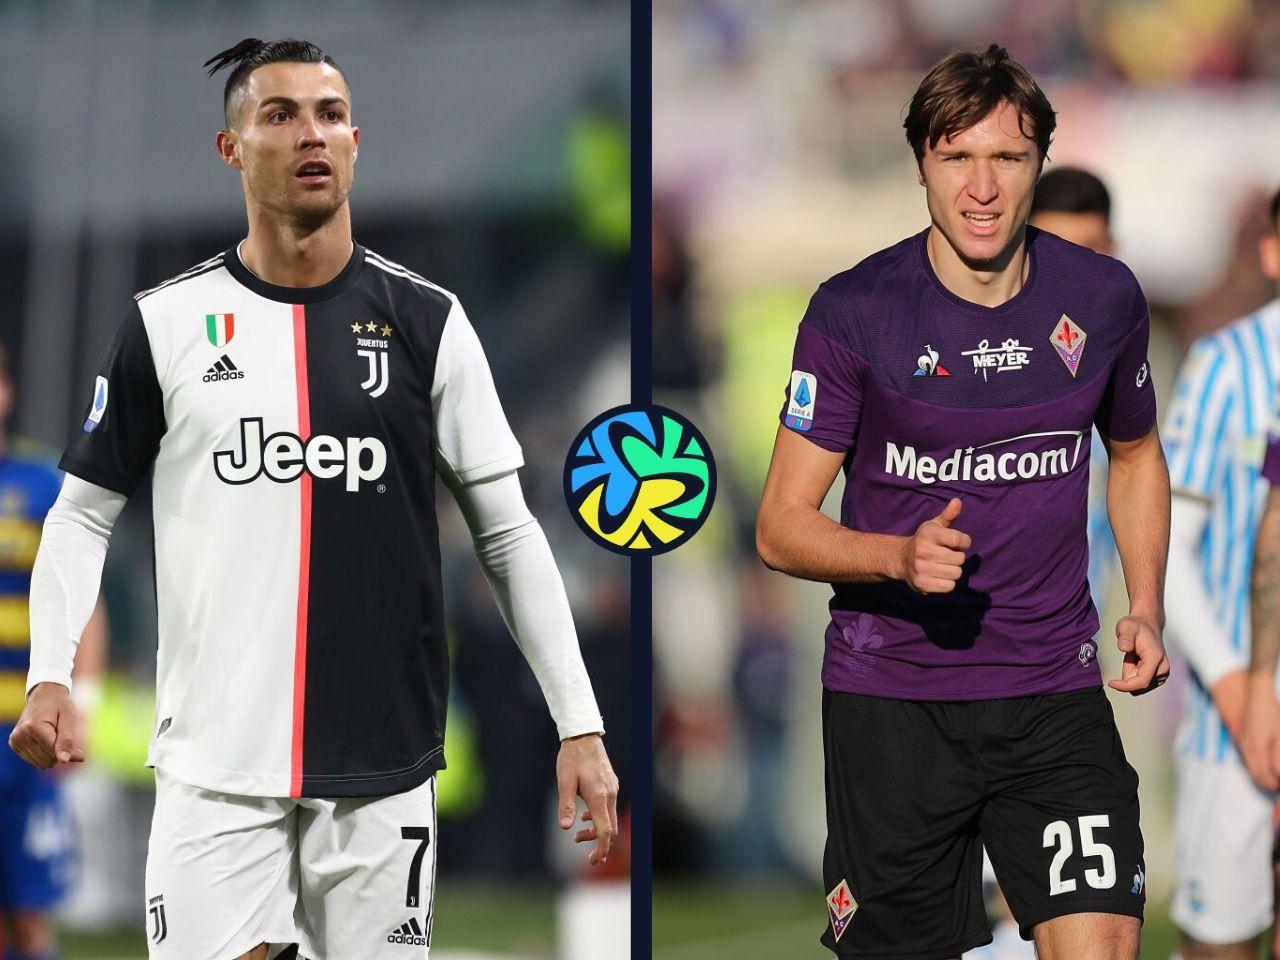 Predicted Xi Juventus Vs Fiorentina Ronaldo Com